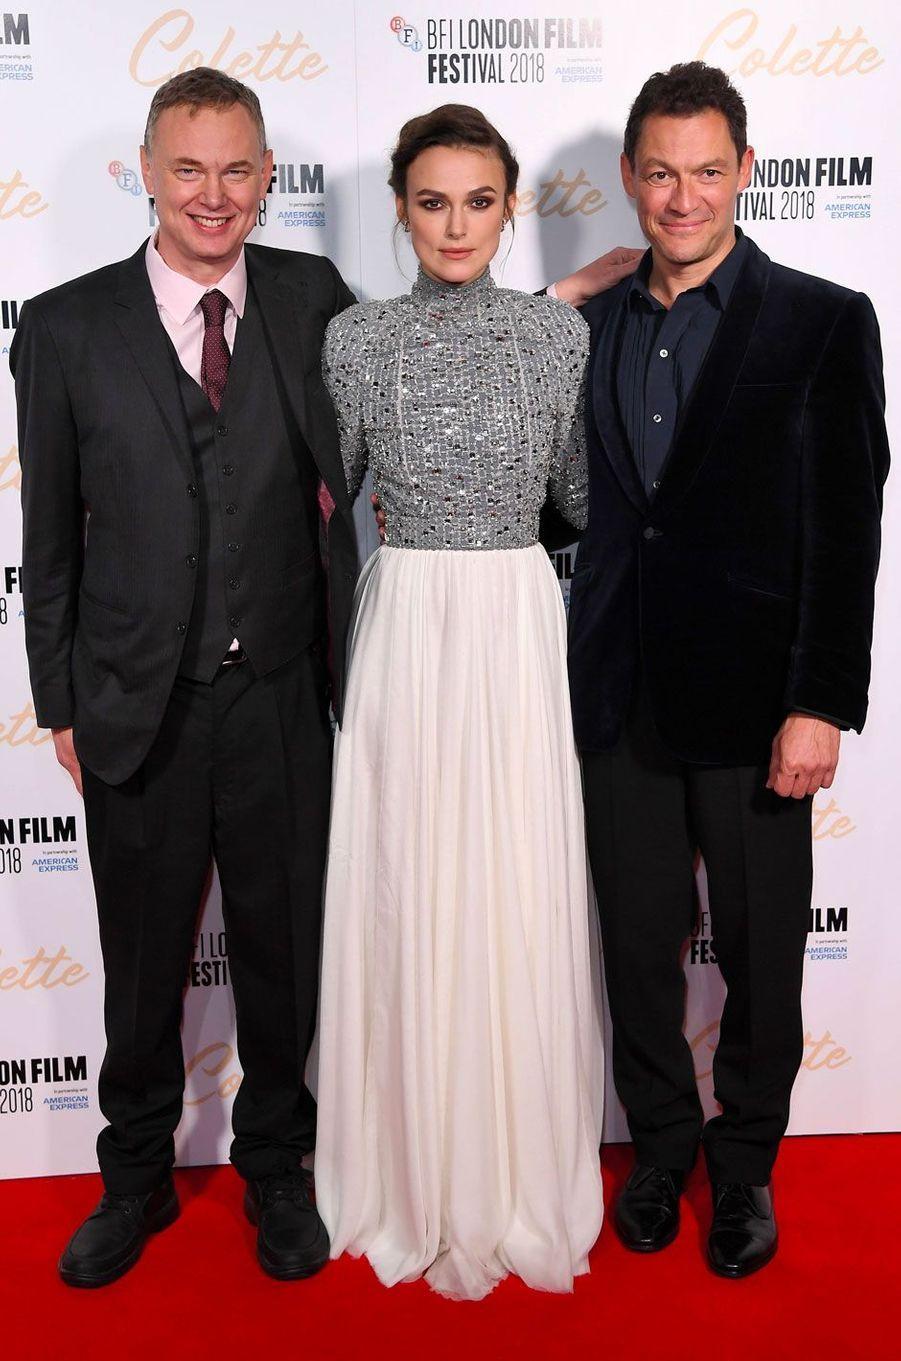 Wash Westmoreland, Keira Knightley et Dominic West